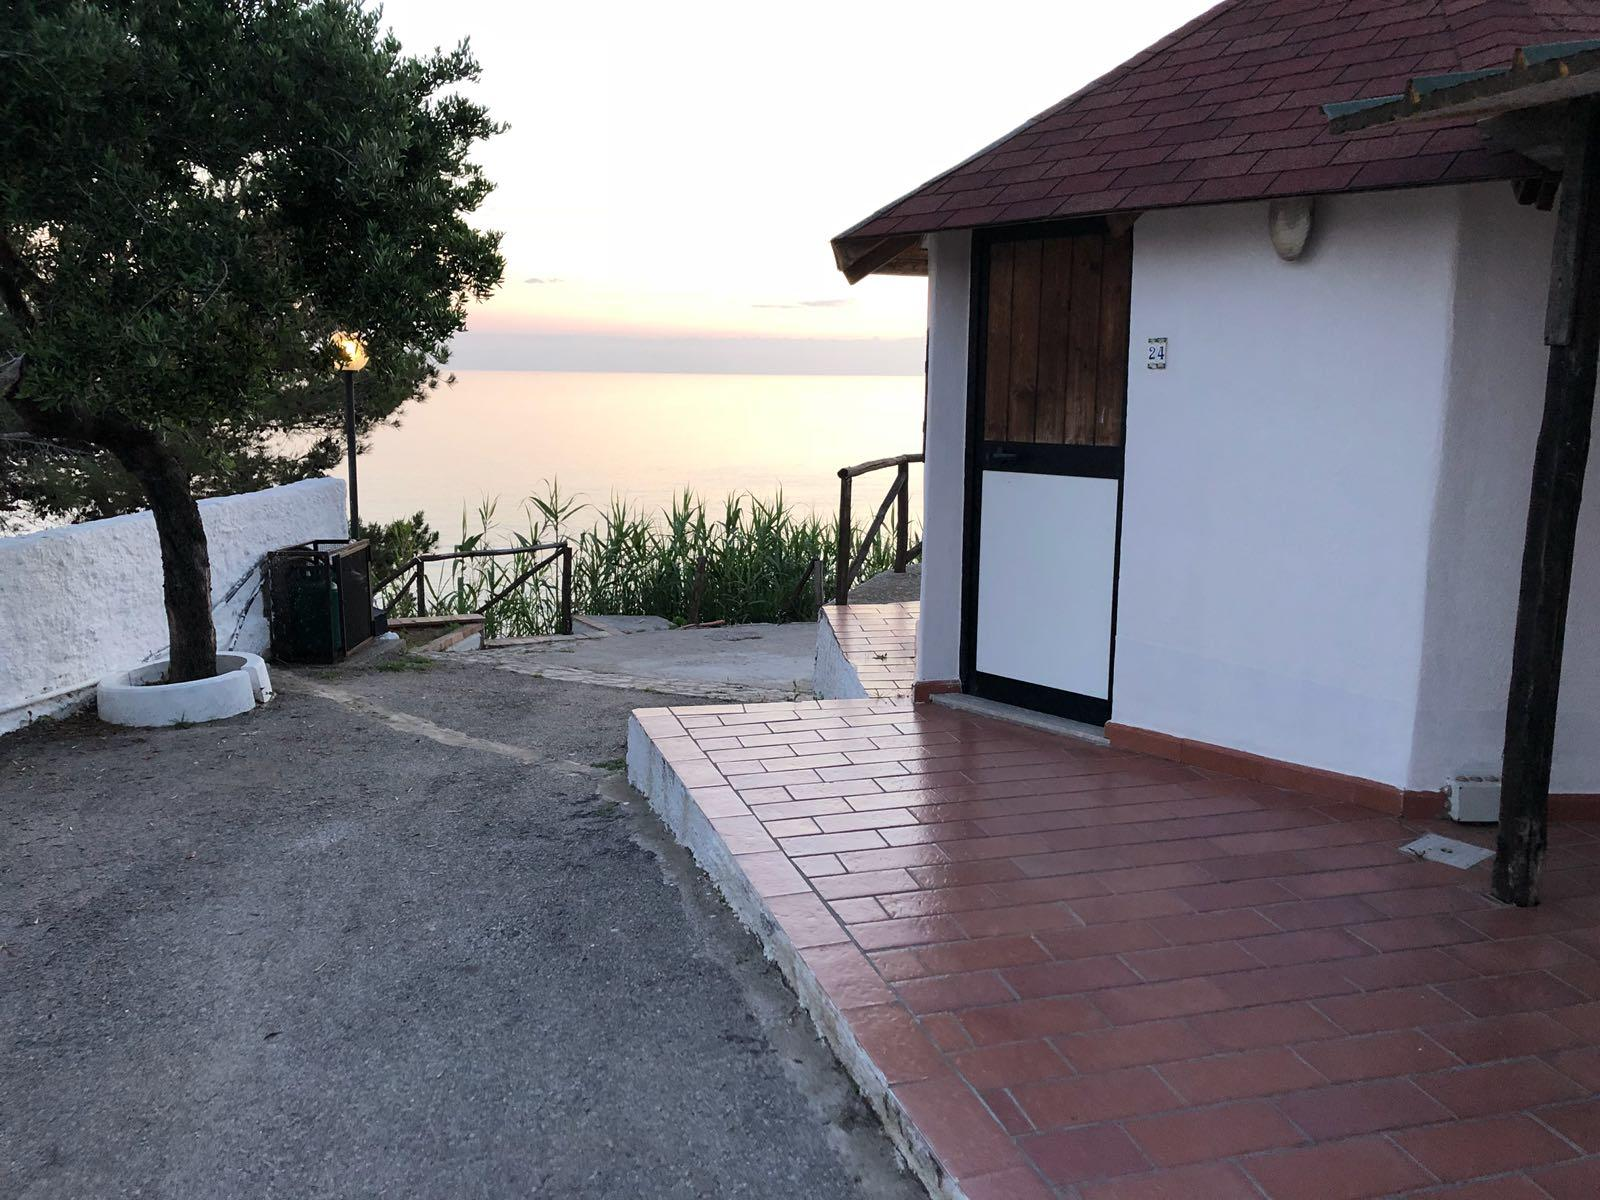 Tukul - Casa a strapiombo sul mare - Punta Cilento Residence Palinuro Salerno